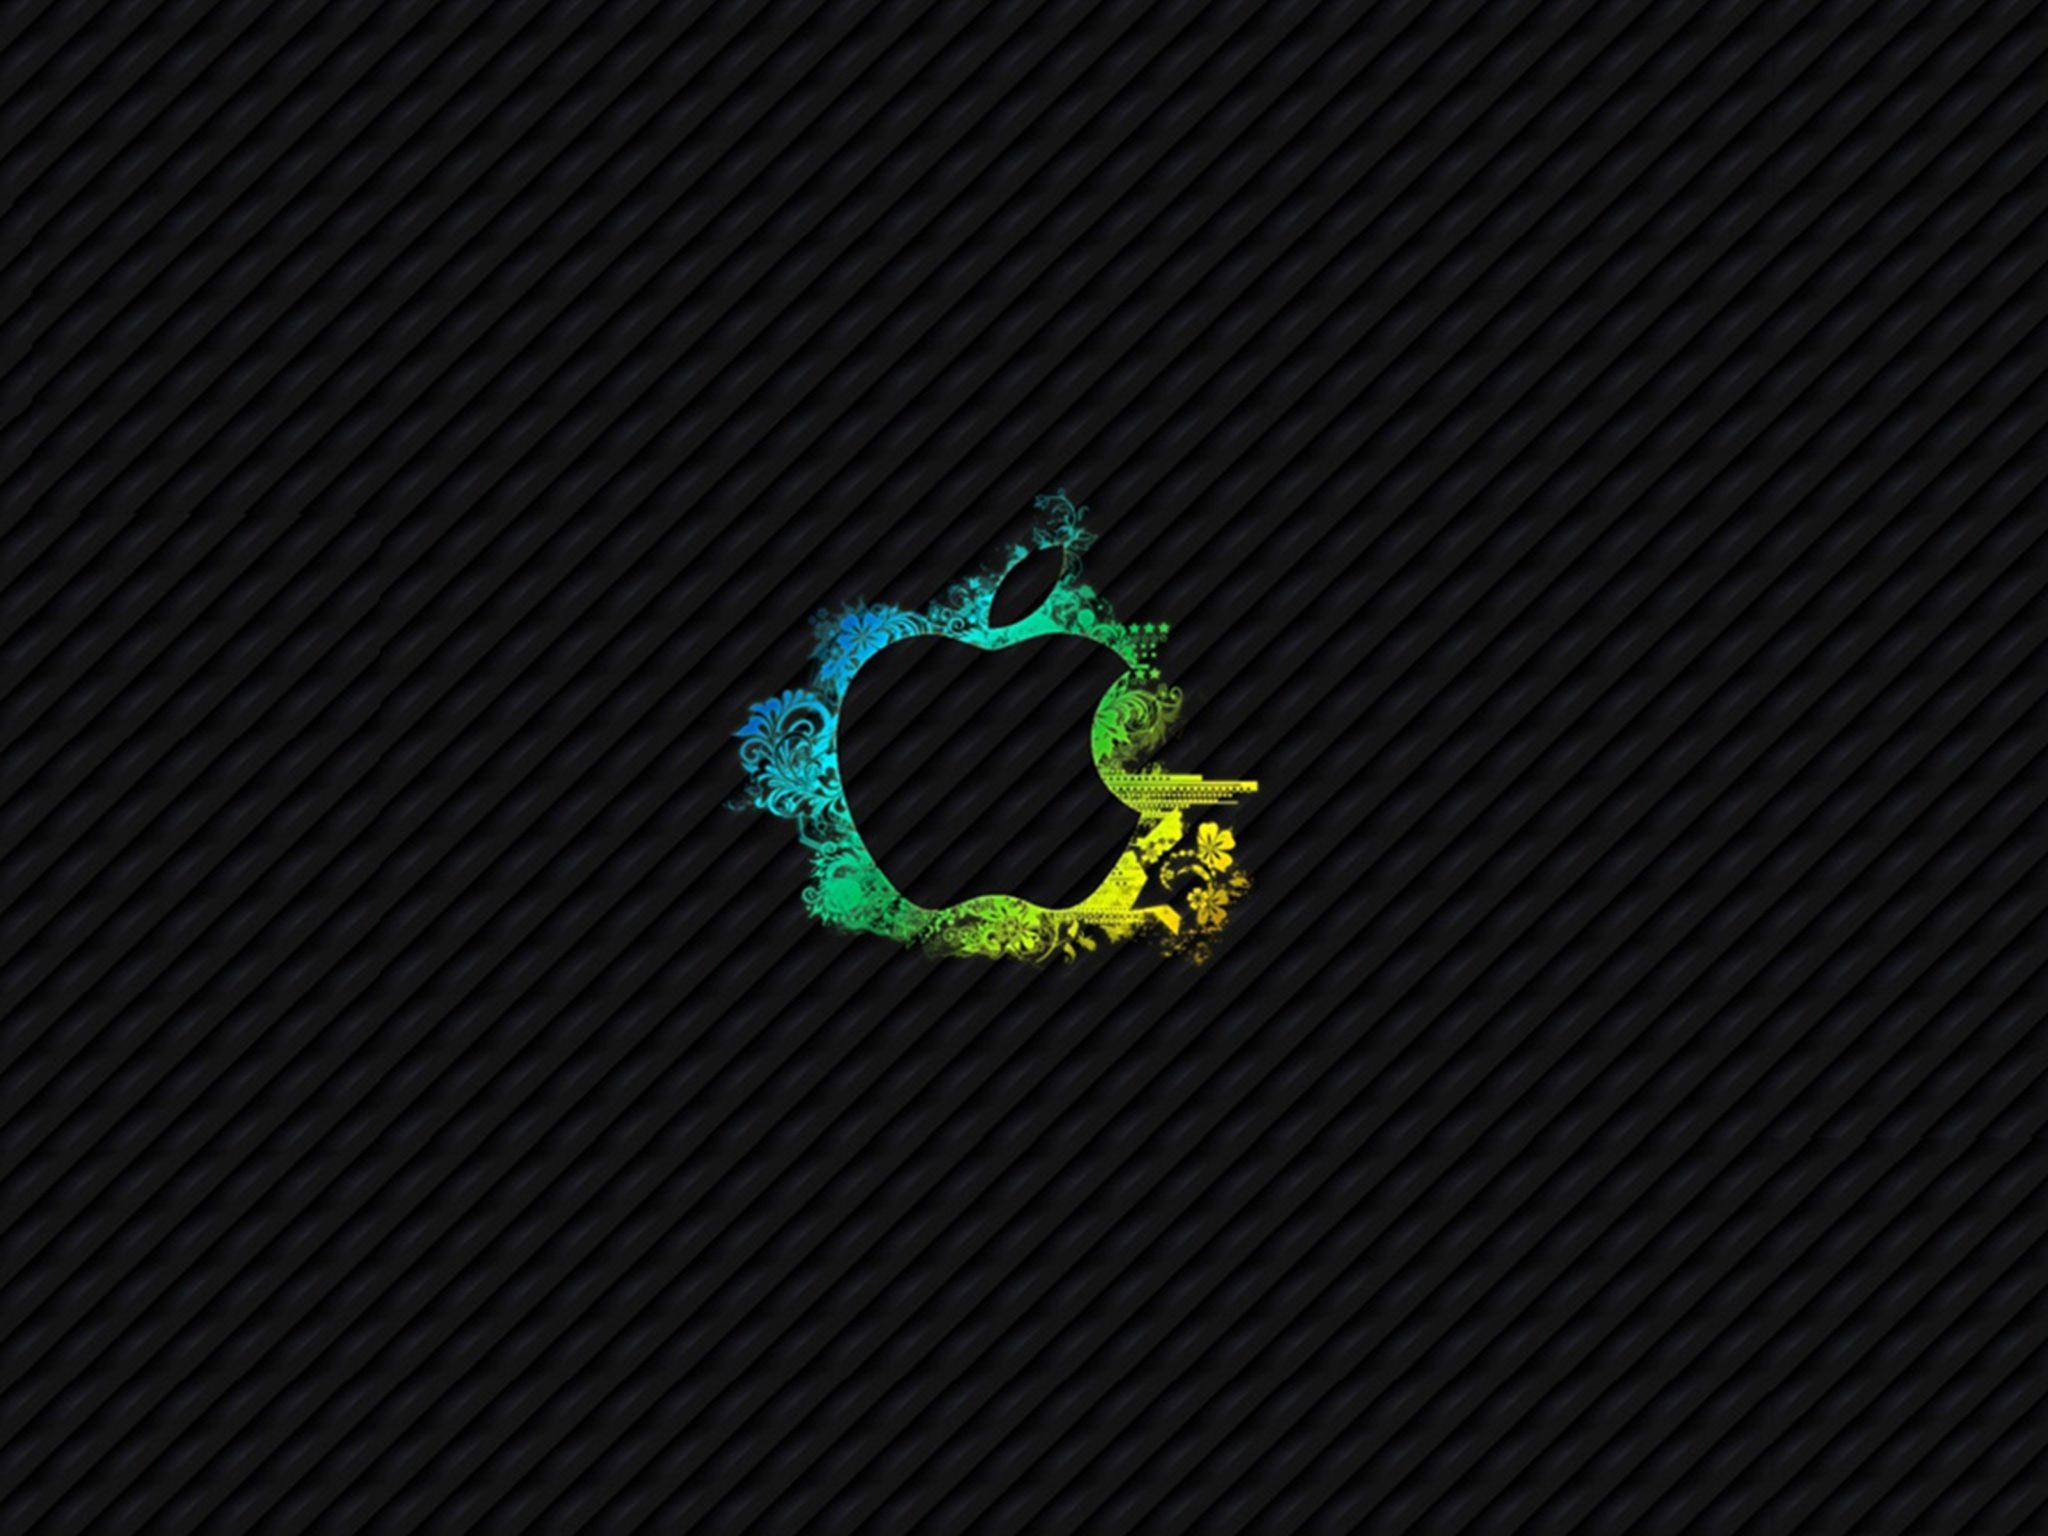 2048x1536 wallpaper Apple Wallpaper Ipad Wallpaper 2048x1536 pixels resolution